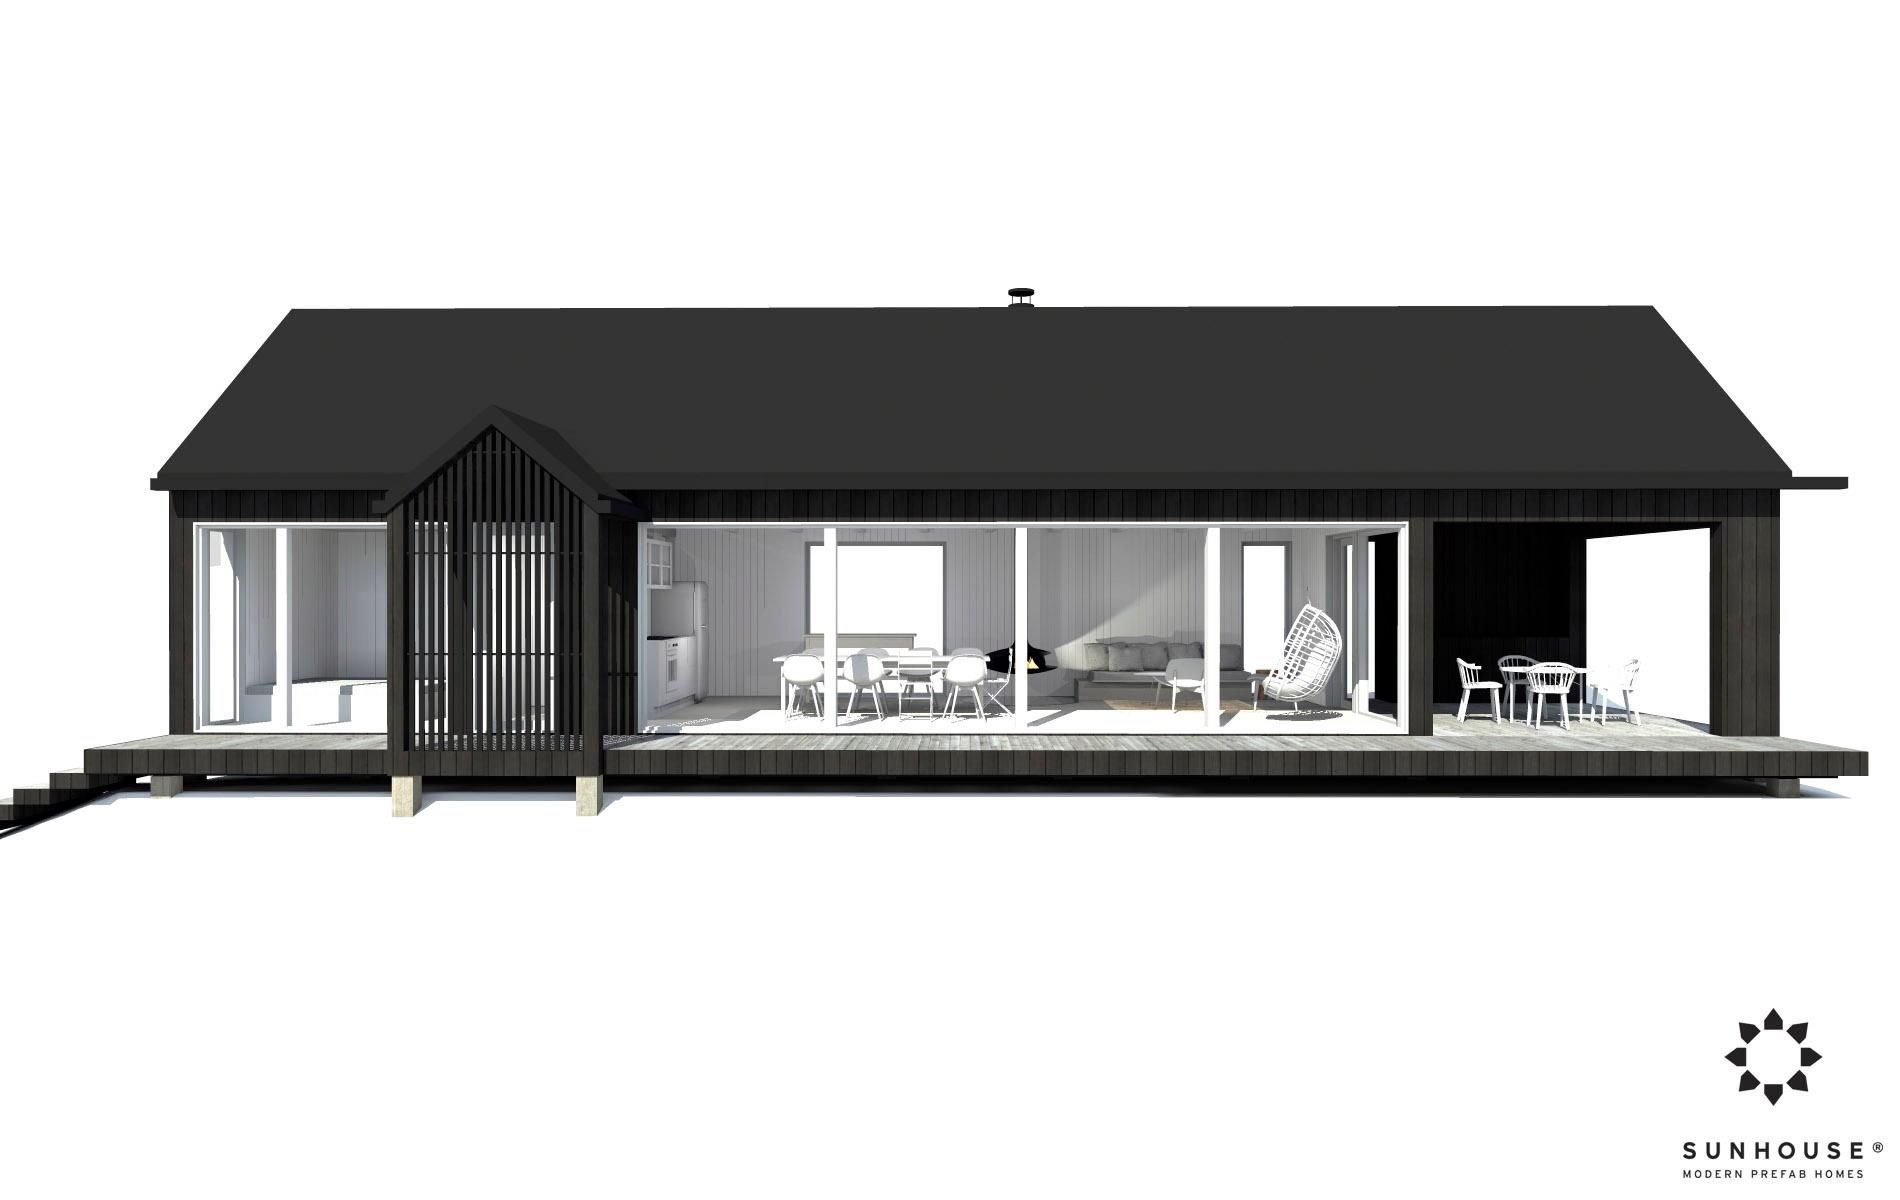 Sunhouse moderni mökki S1601_ulkoa (1)